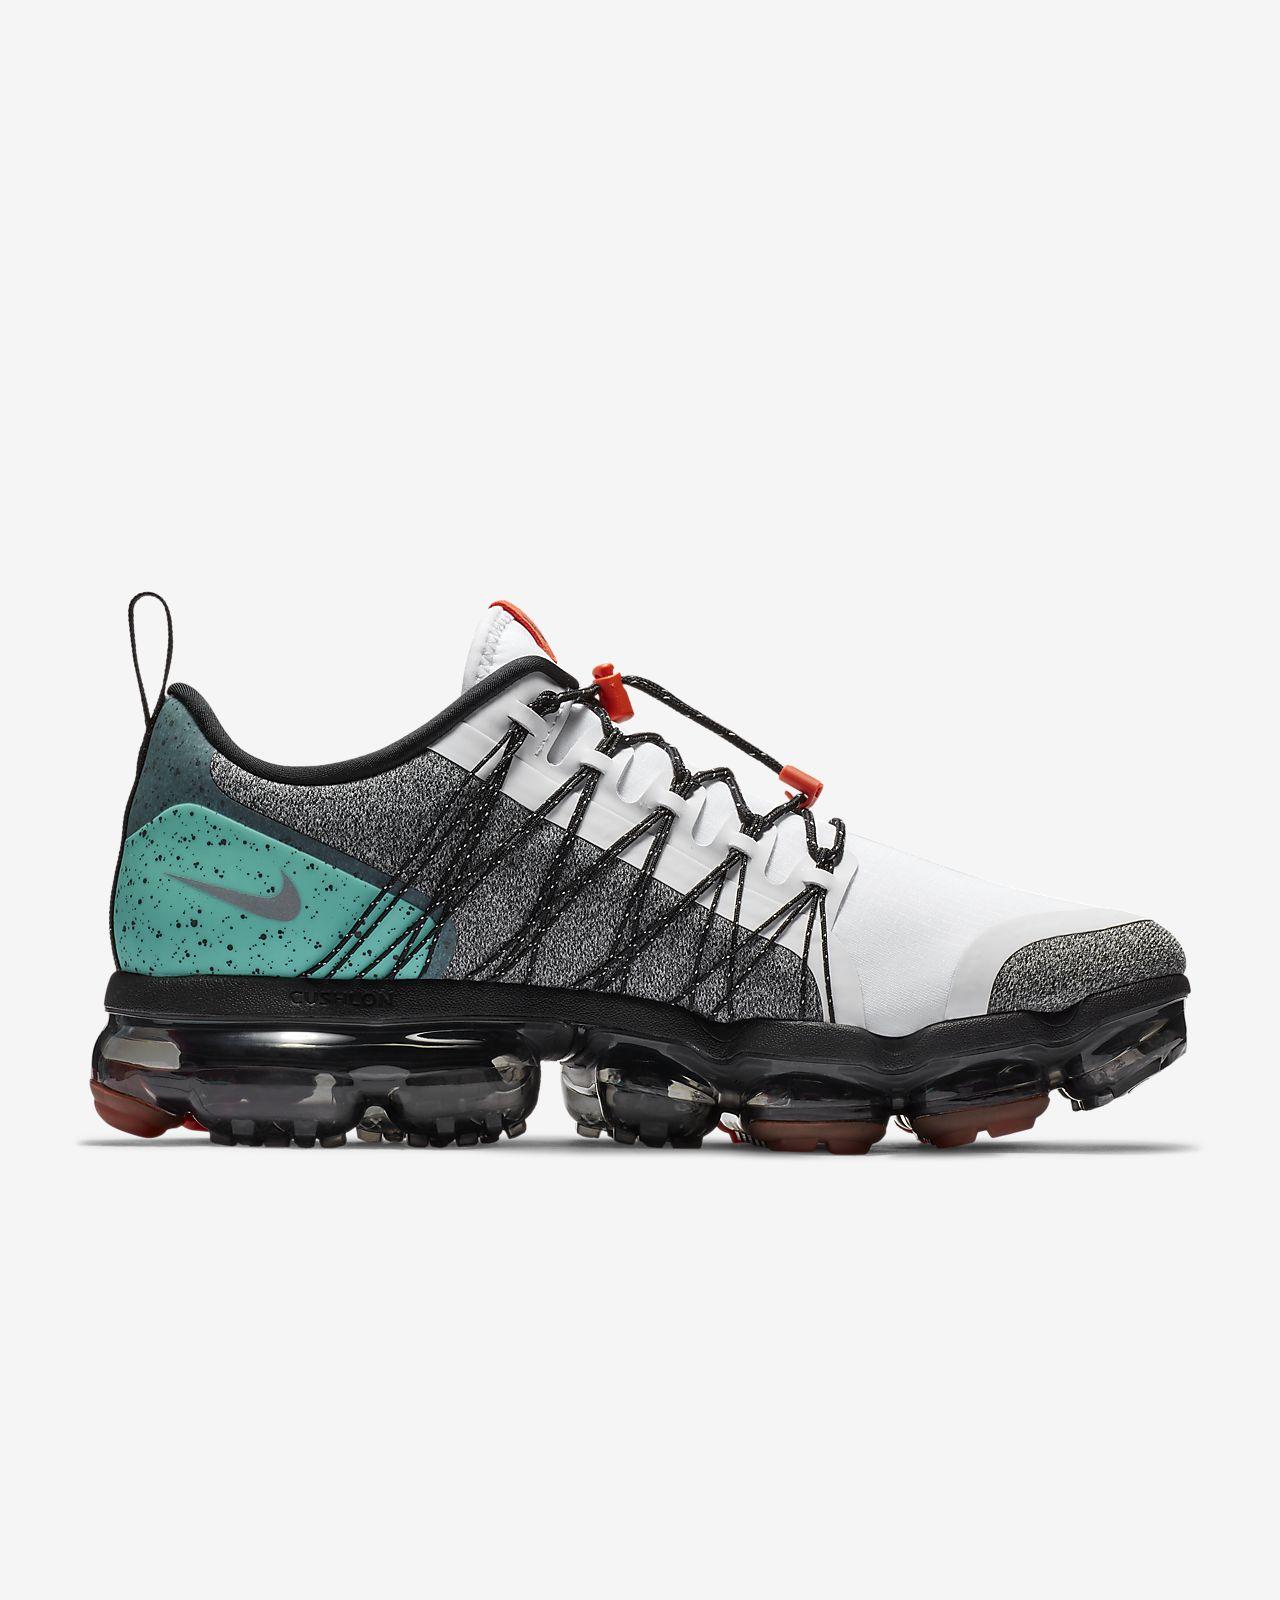 hot sale online 0a516 37892 ... Chaussure Nike Air VaporMax Utility pour Homme